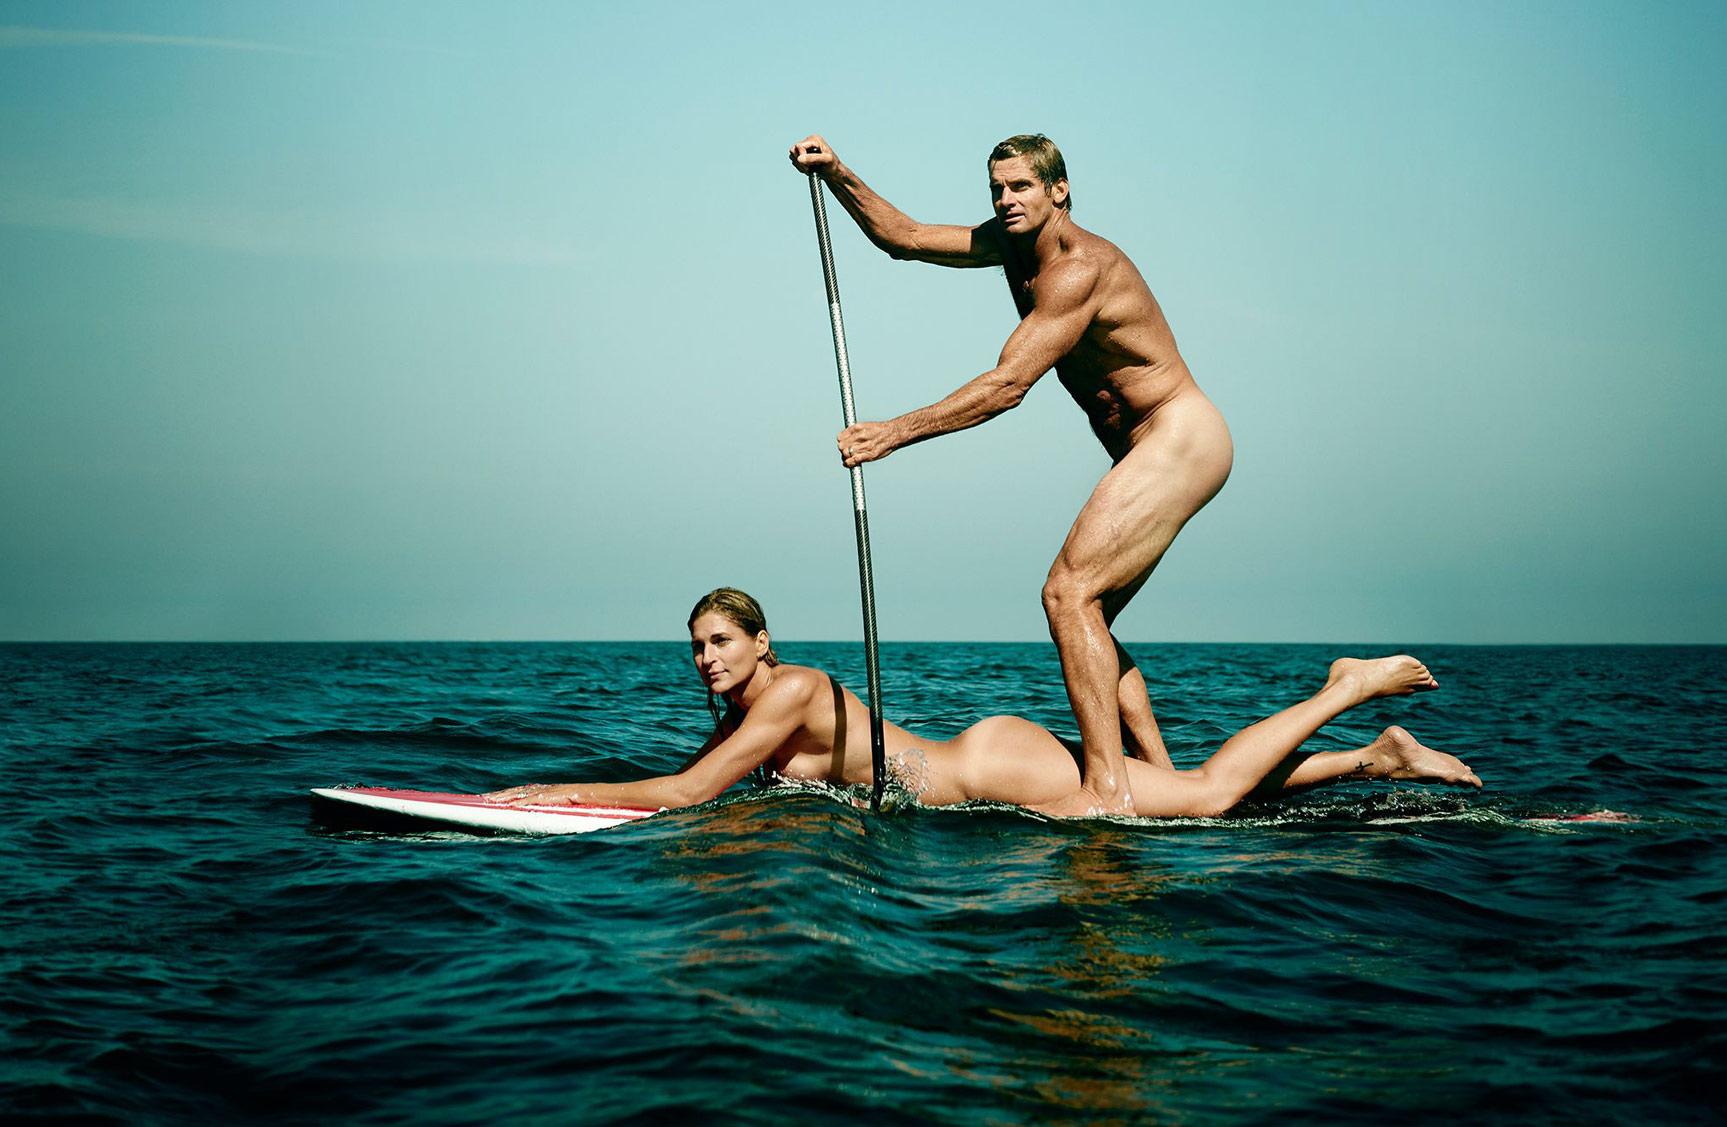 ESPN Magazine The Body Issue 2015 - Gabrielle Reece and Laird Hamilton / Габриэль Рис и Лэрд Гамильтон - Культ тела журнала ESPN